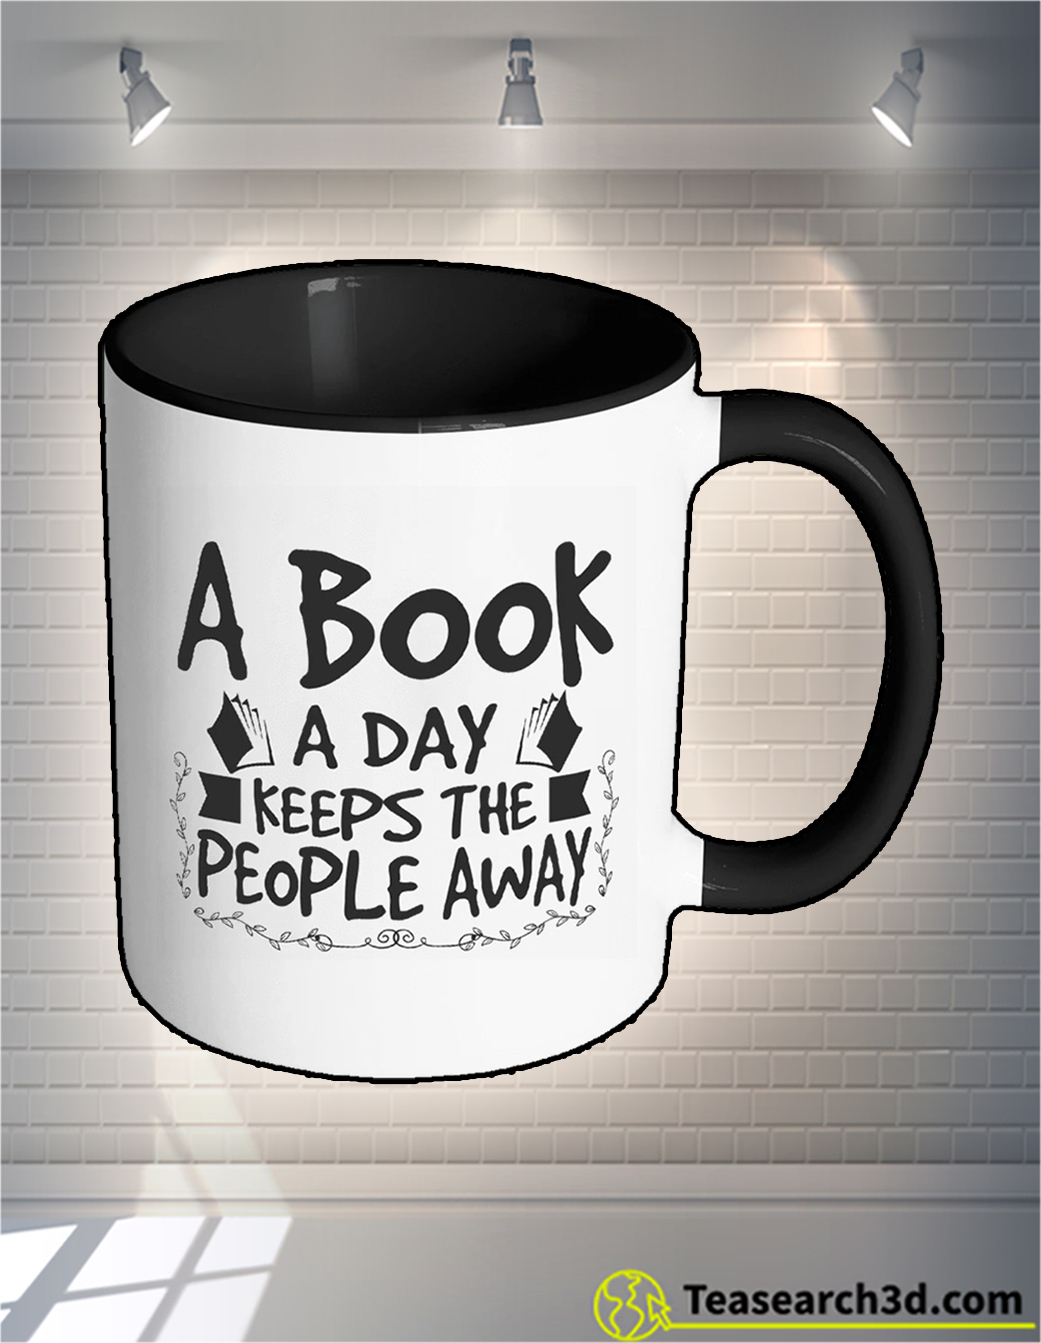 A book a day keeps the people away mug 11oz